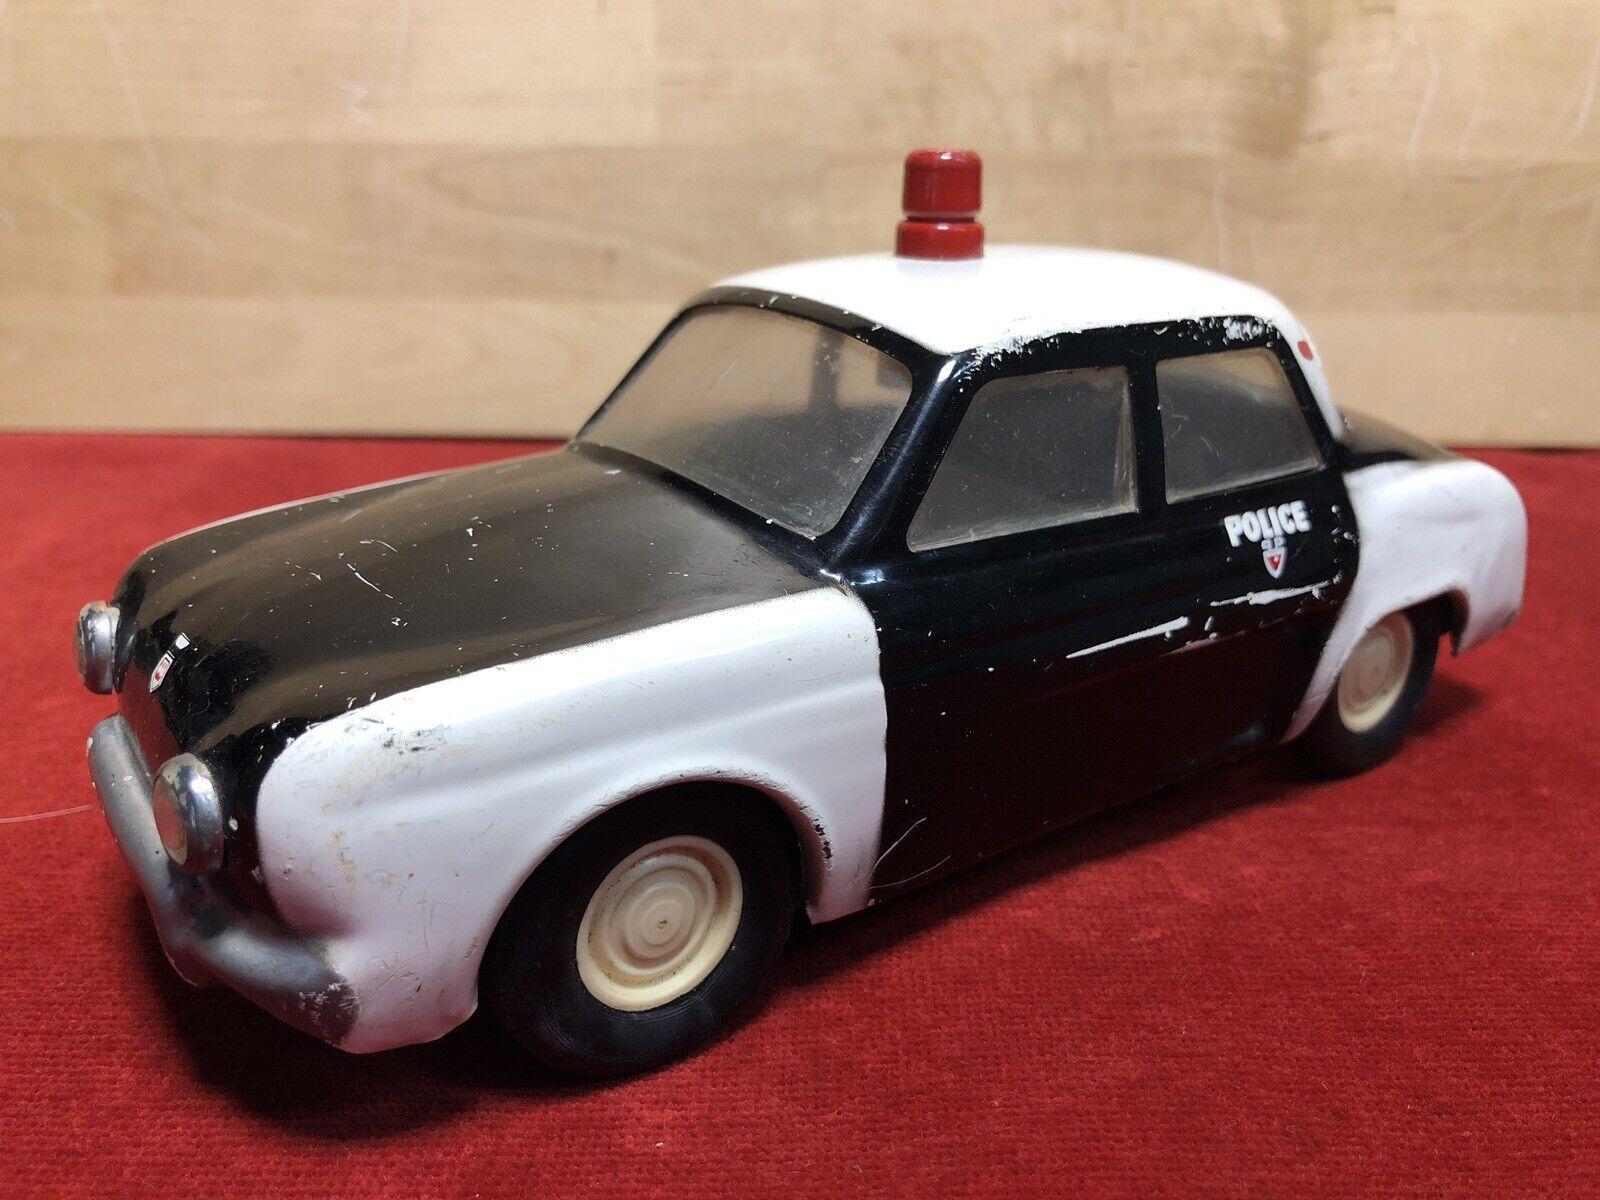 5 57 France CIJ Renault Dauphine Police Toy Antique Metal Clutch